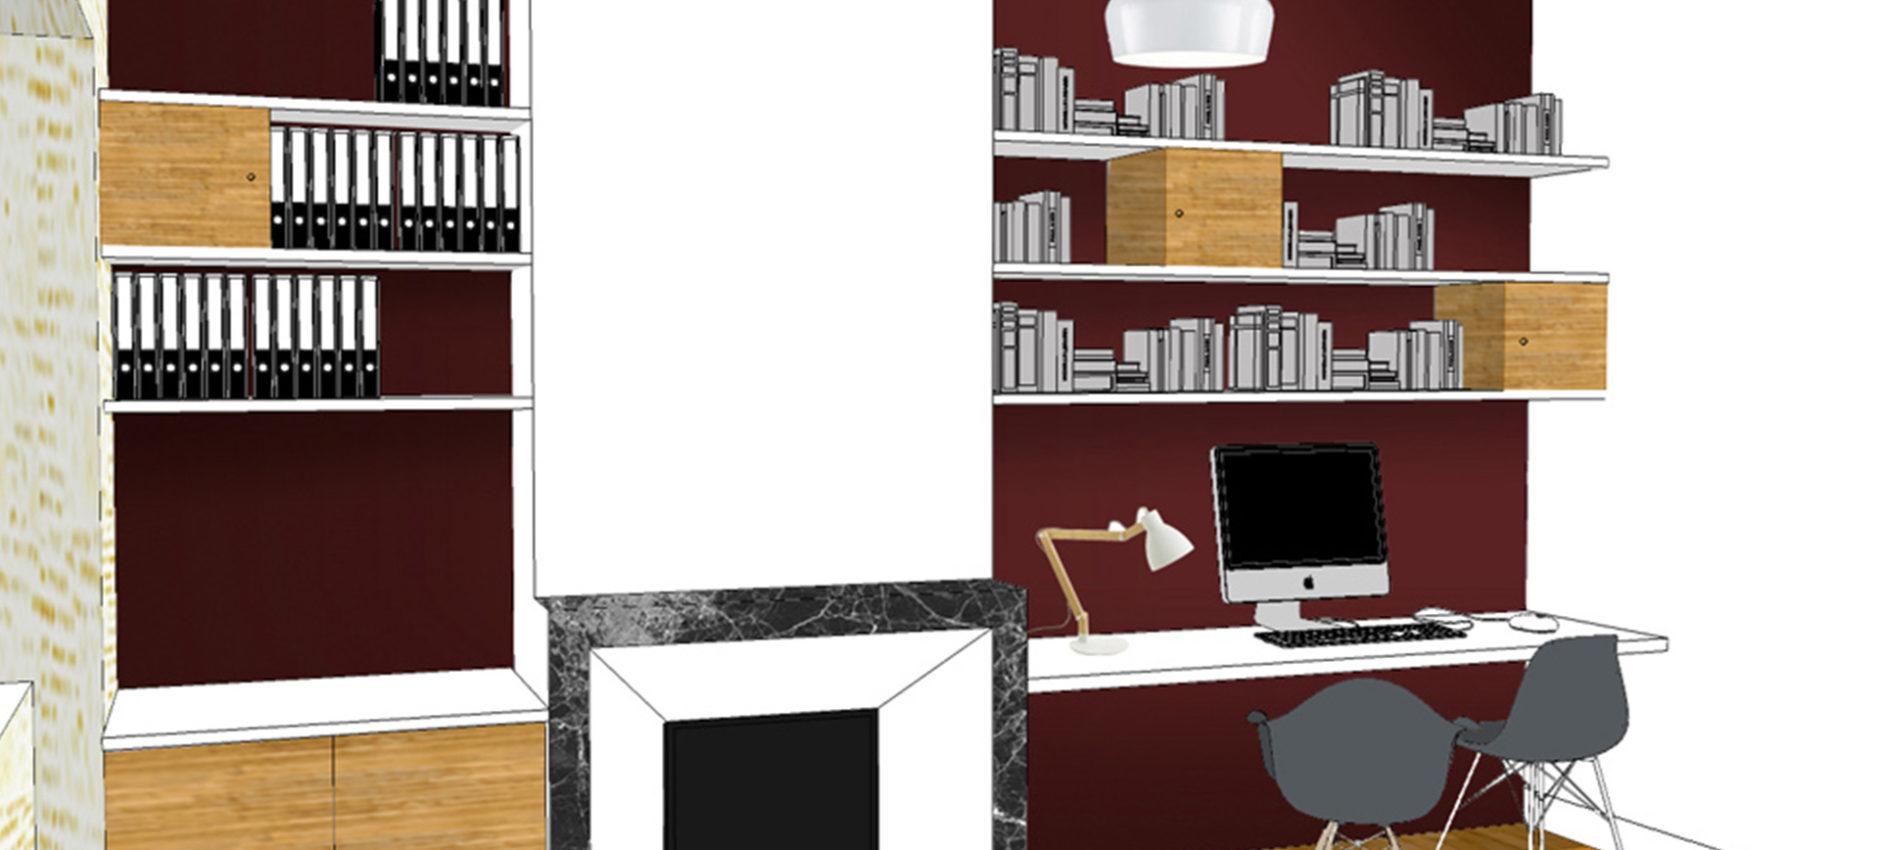 boca_architecture_projet_maison_AG_03.jpg